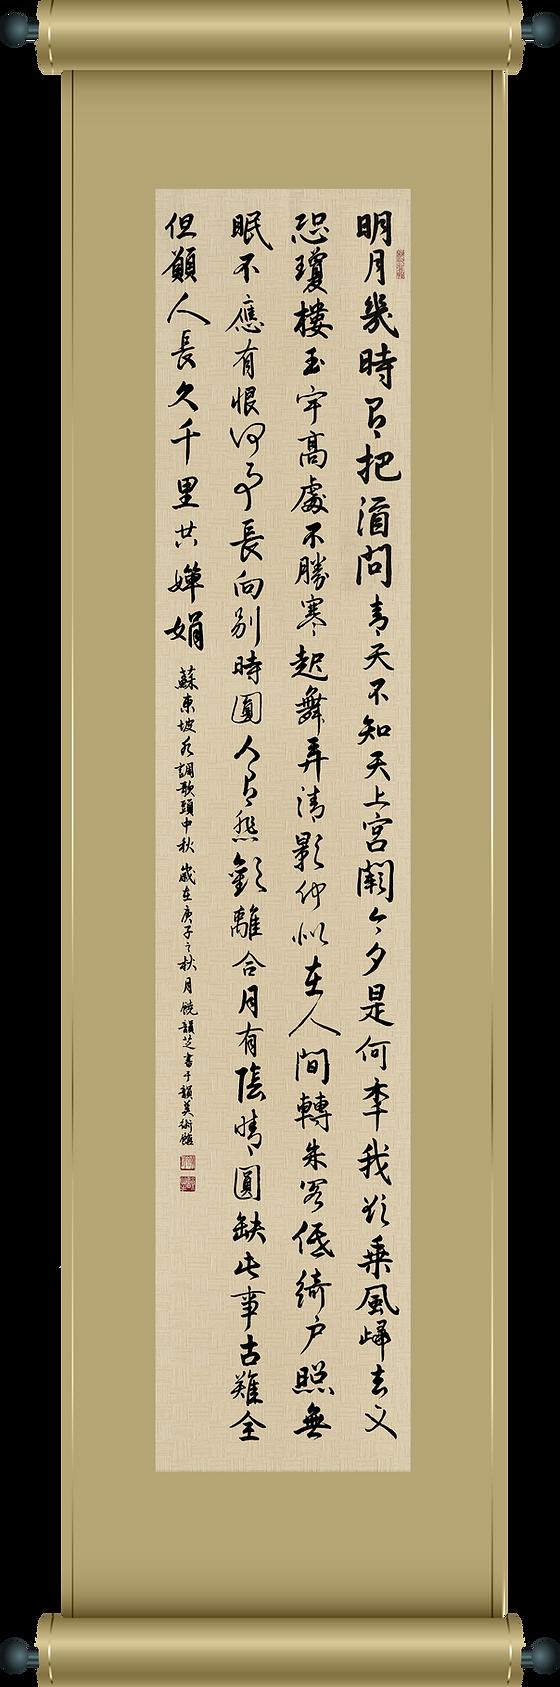 019-饒韻芝.png